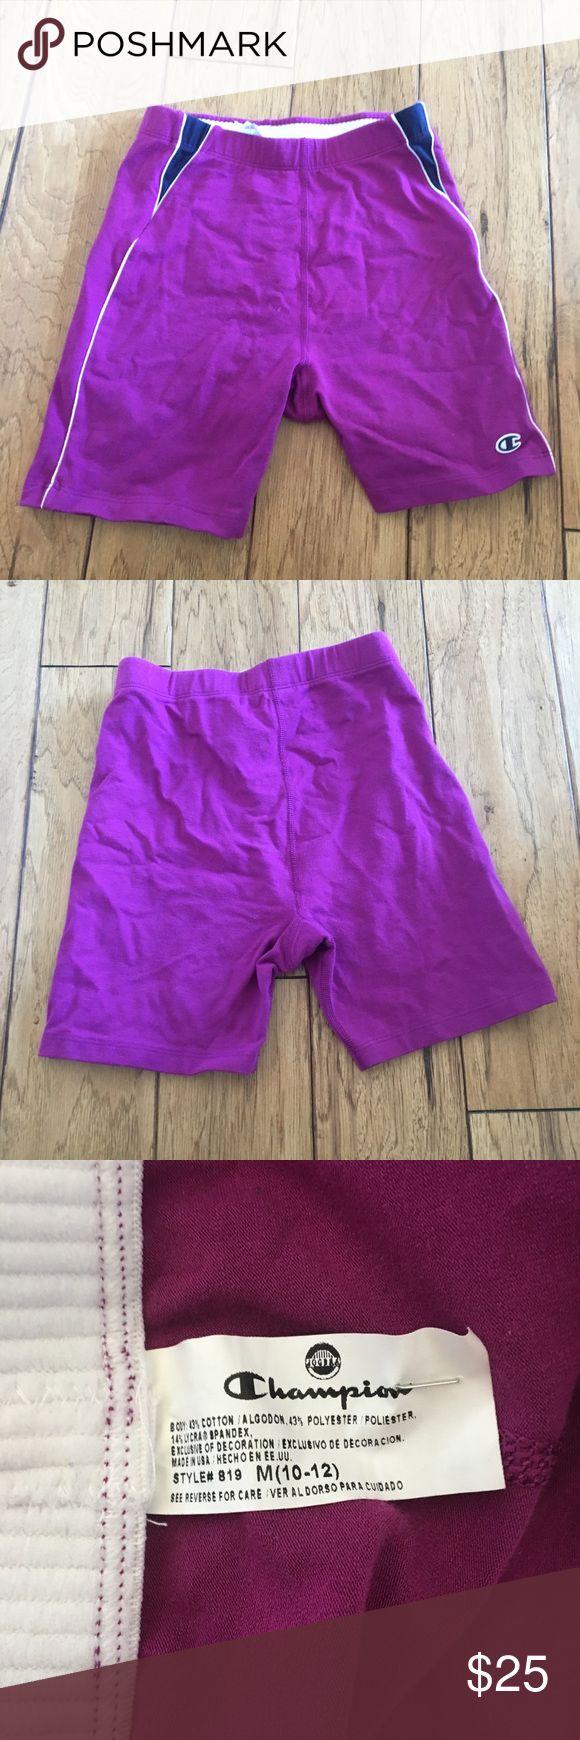 purple champion compression shorts Vintage Stretch purple champion compression shorts Vintage Logo Women's Medium Stretch Gym Run Champion Shorts